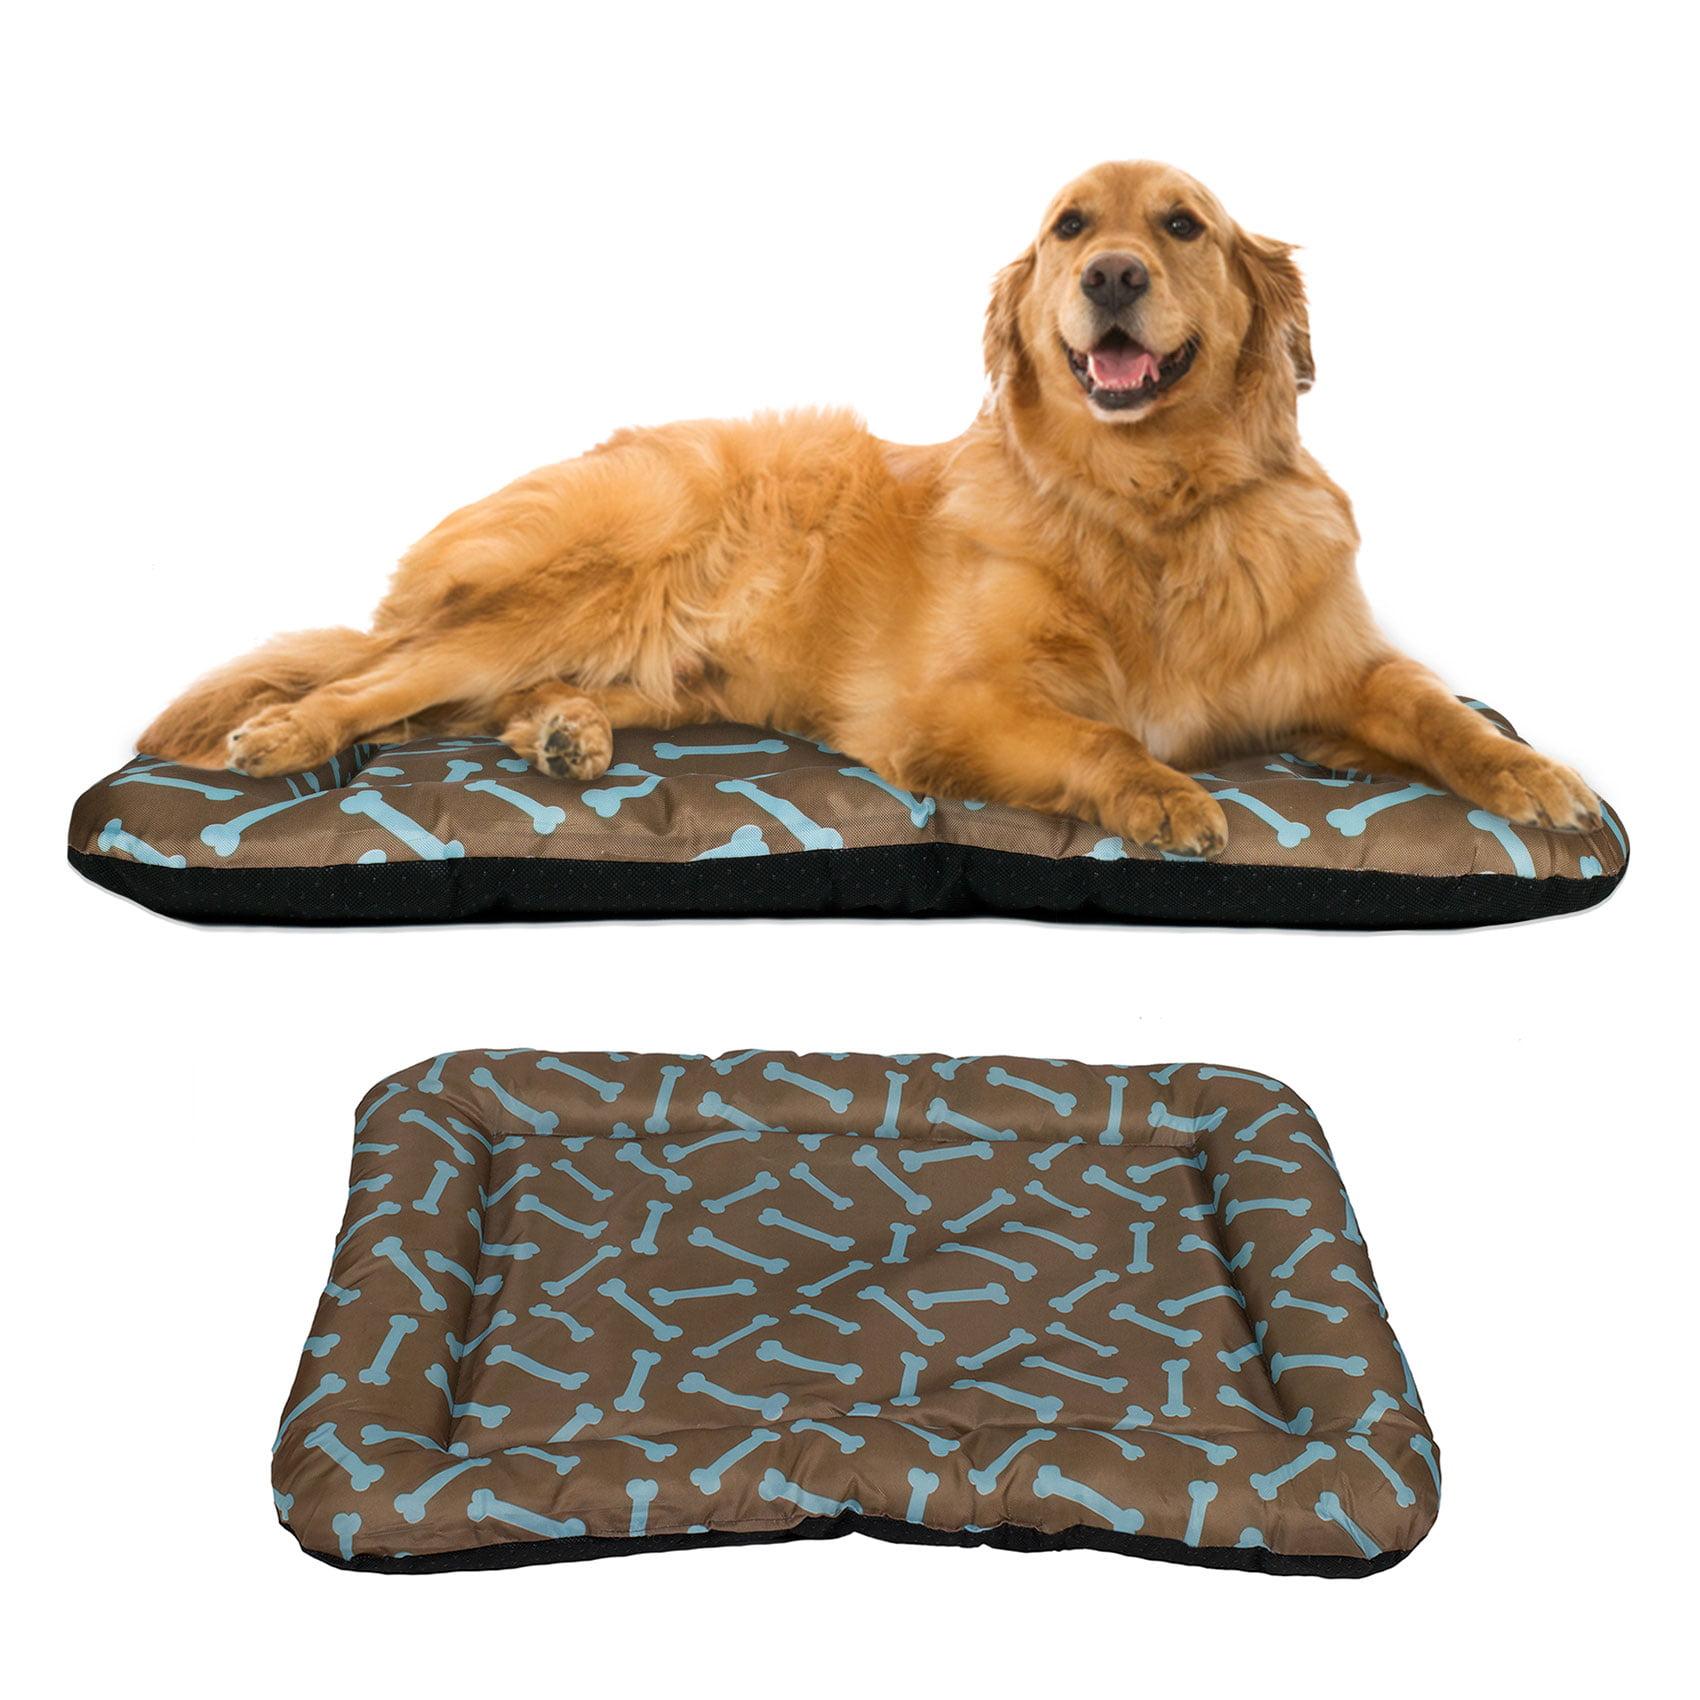 HowPlumb Dog Crate Pad Waterproof Bolster Bed Pet Mat, X-Large, Brown/Blue